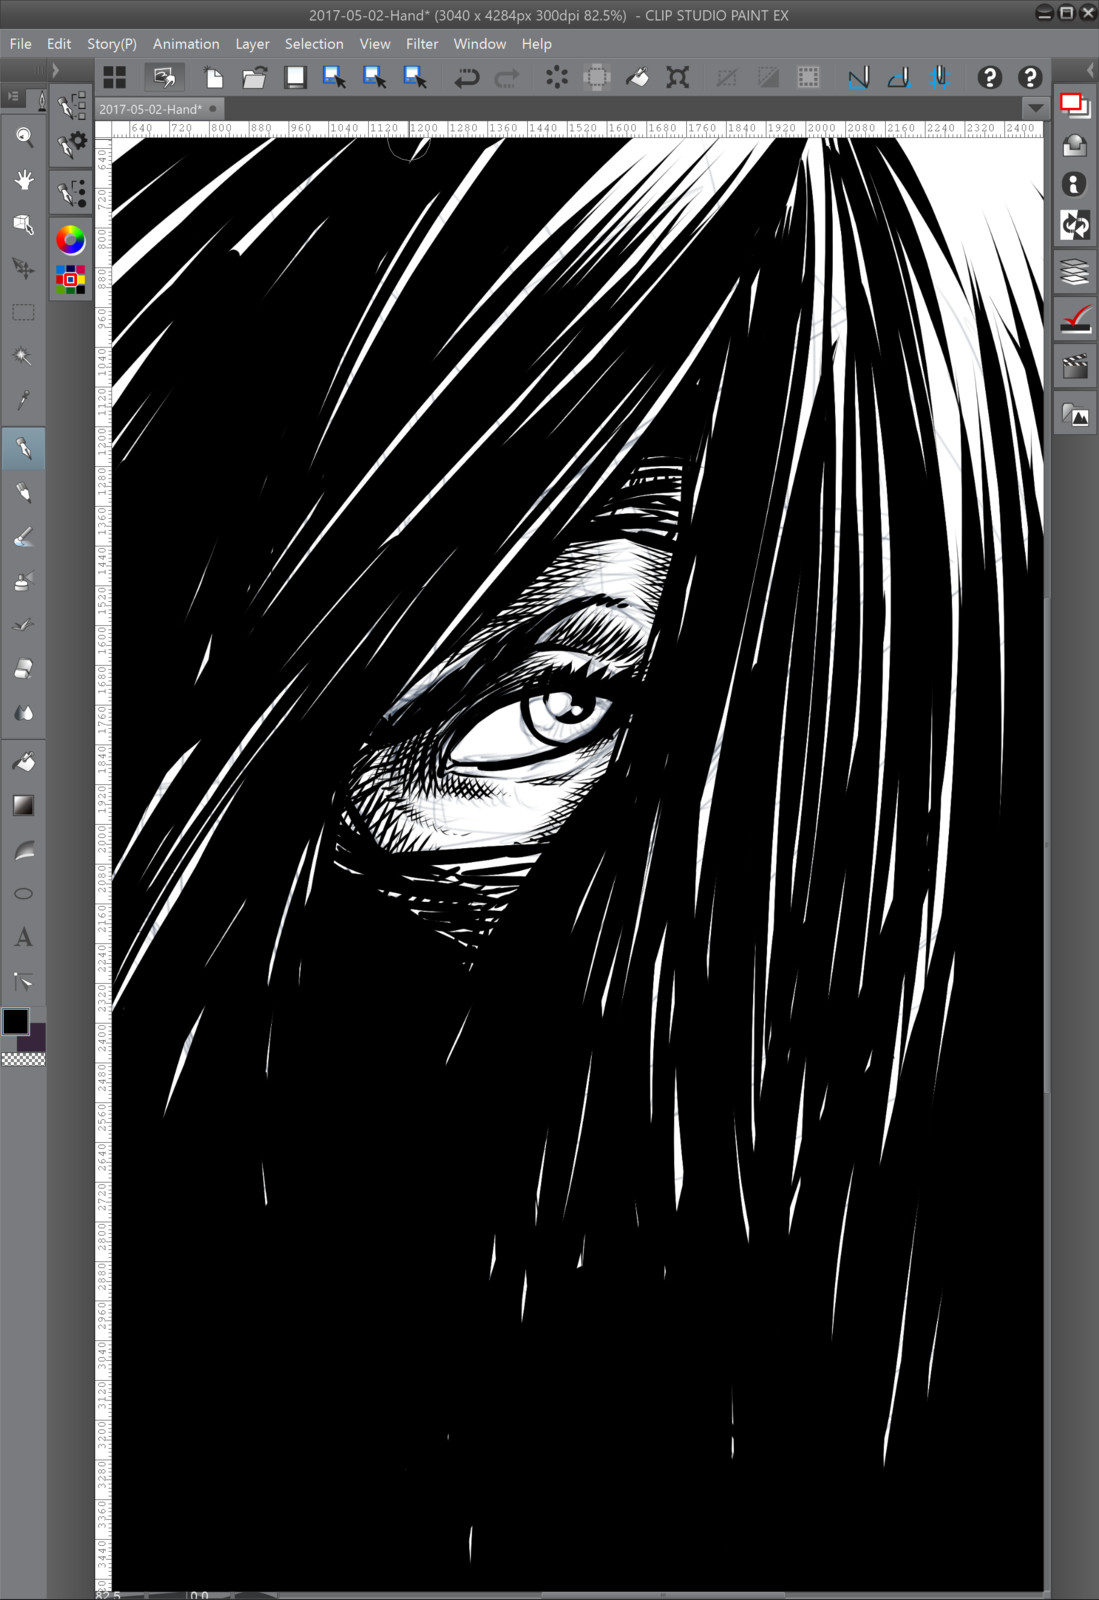 02 - Inking